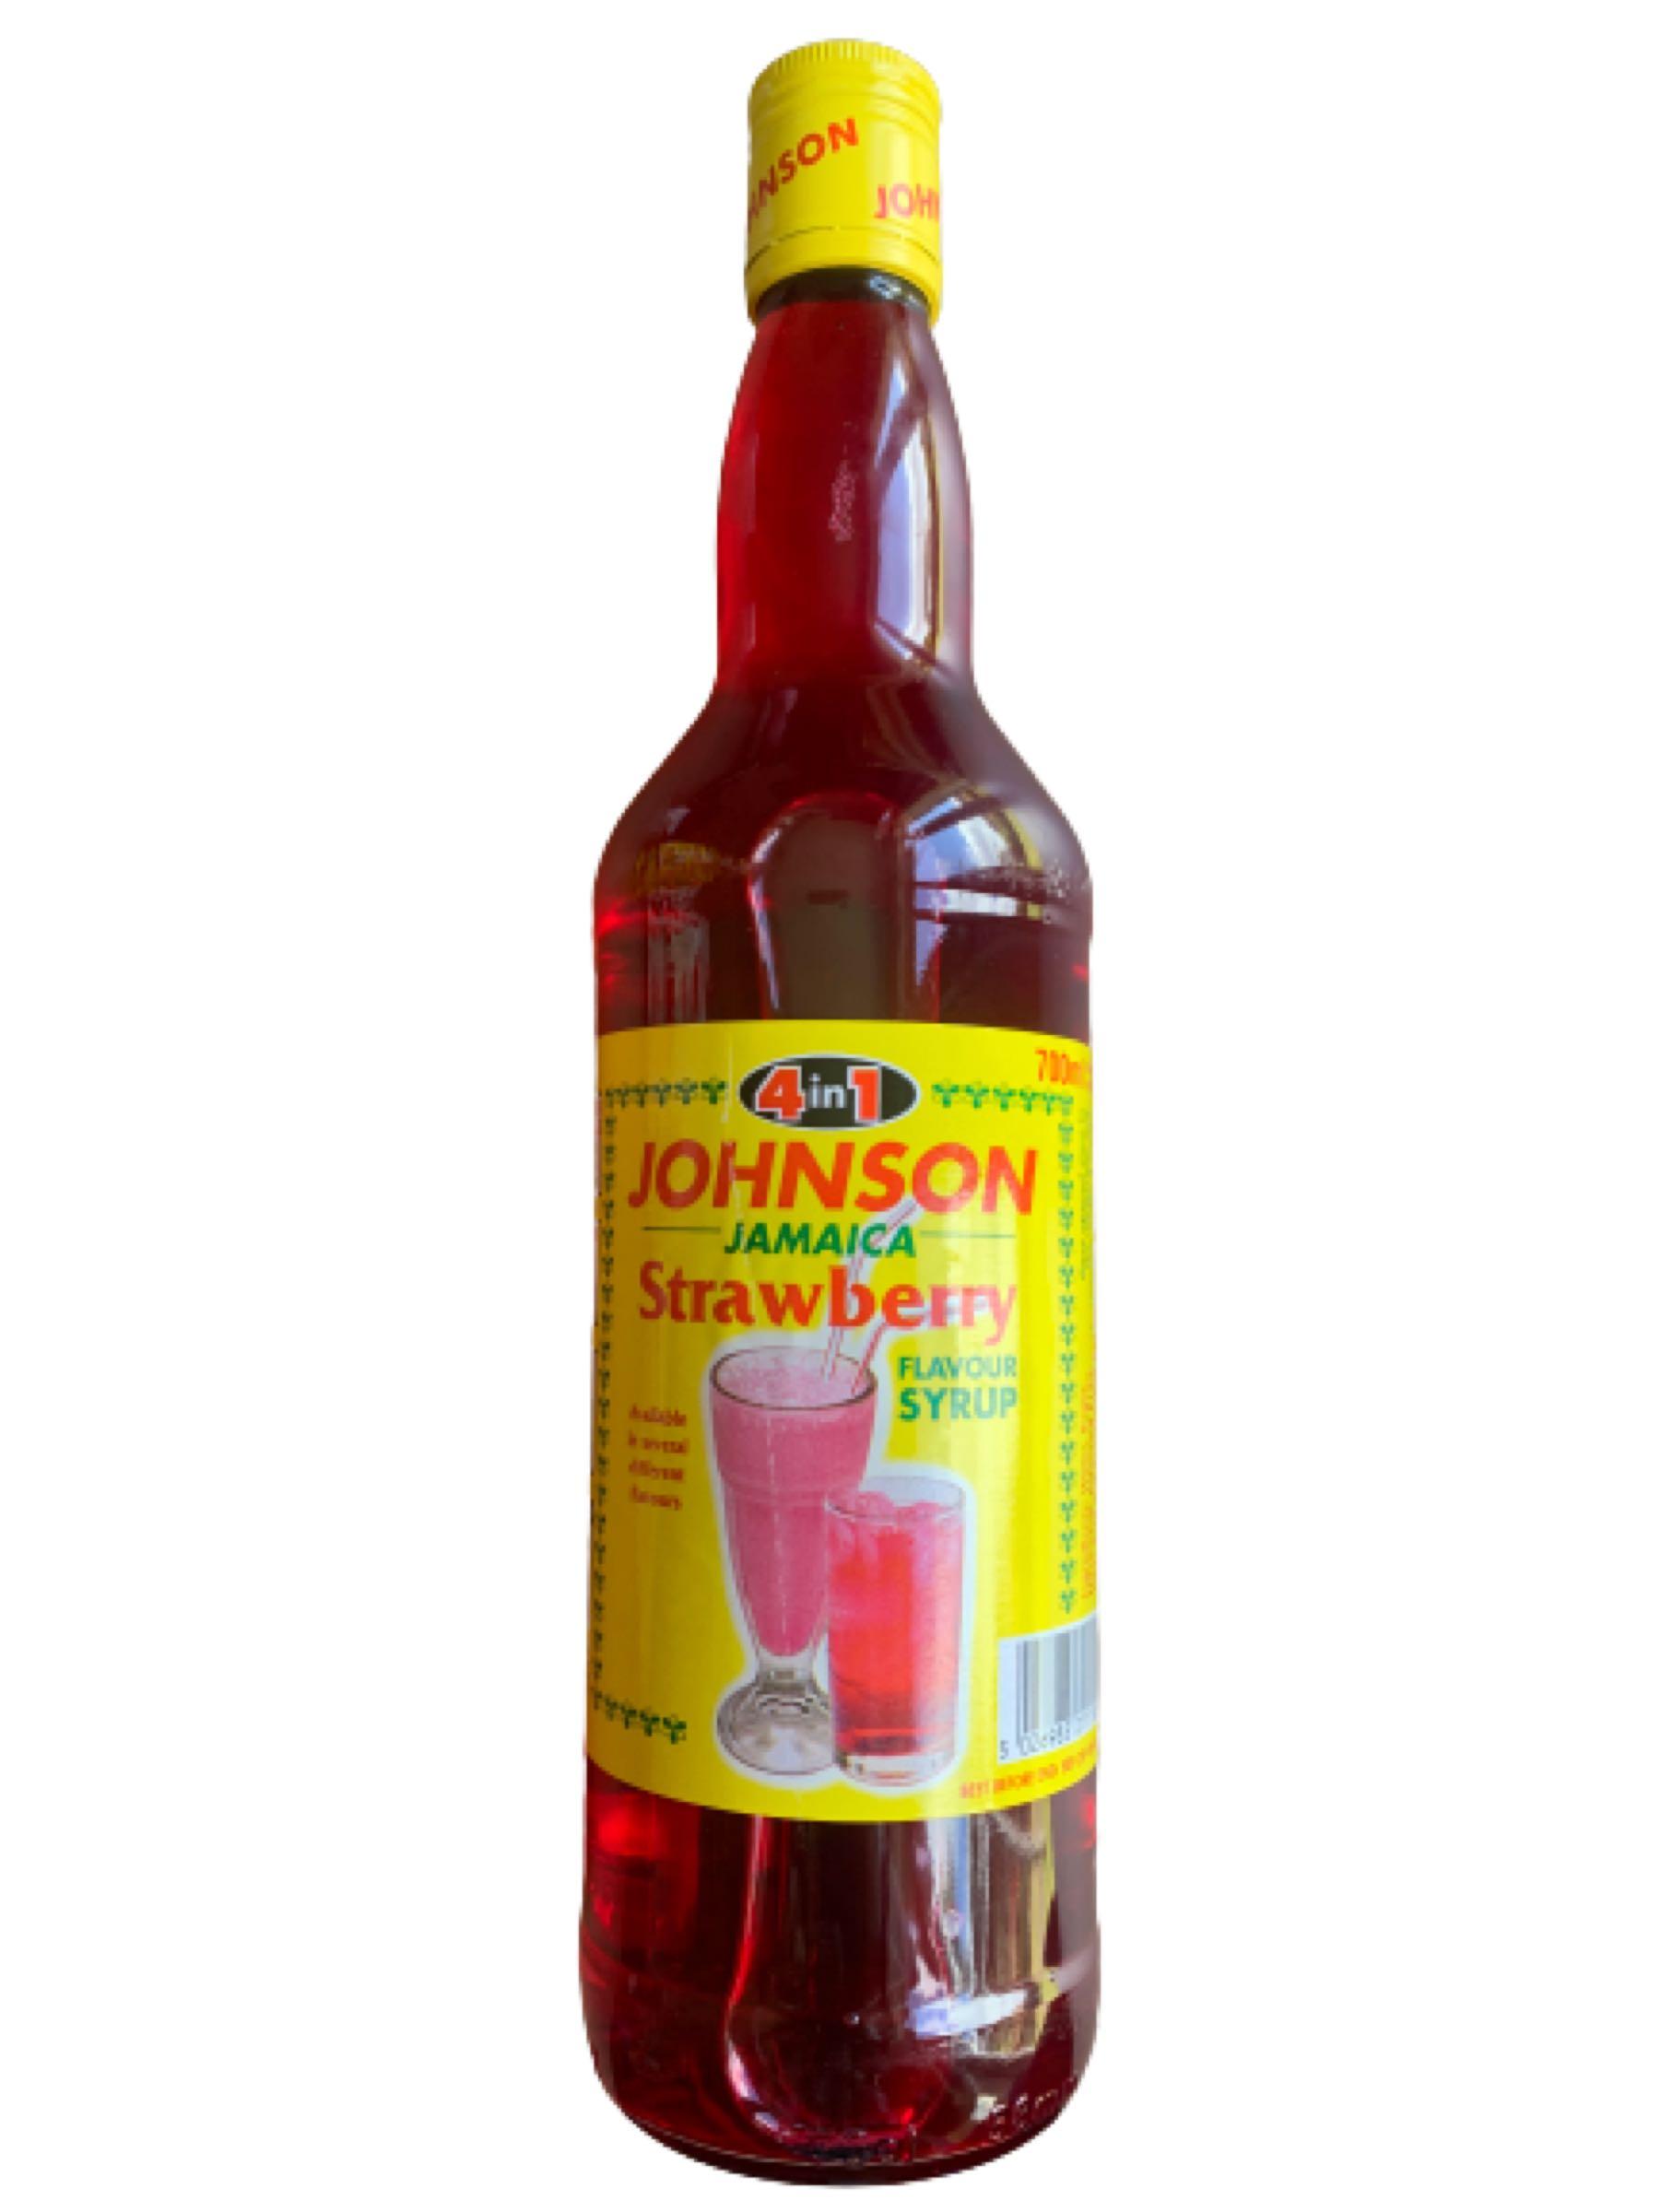 Johnson's 4-1  Strawberry Syrup